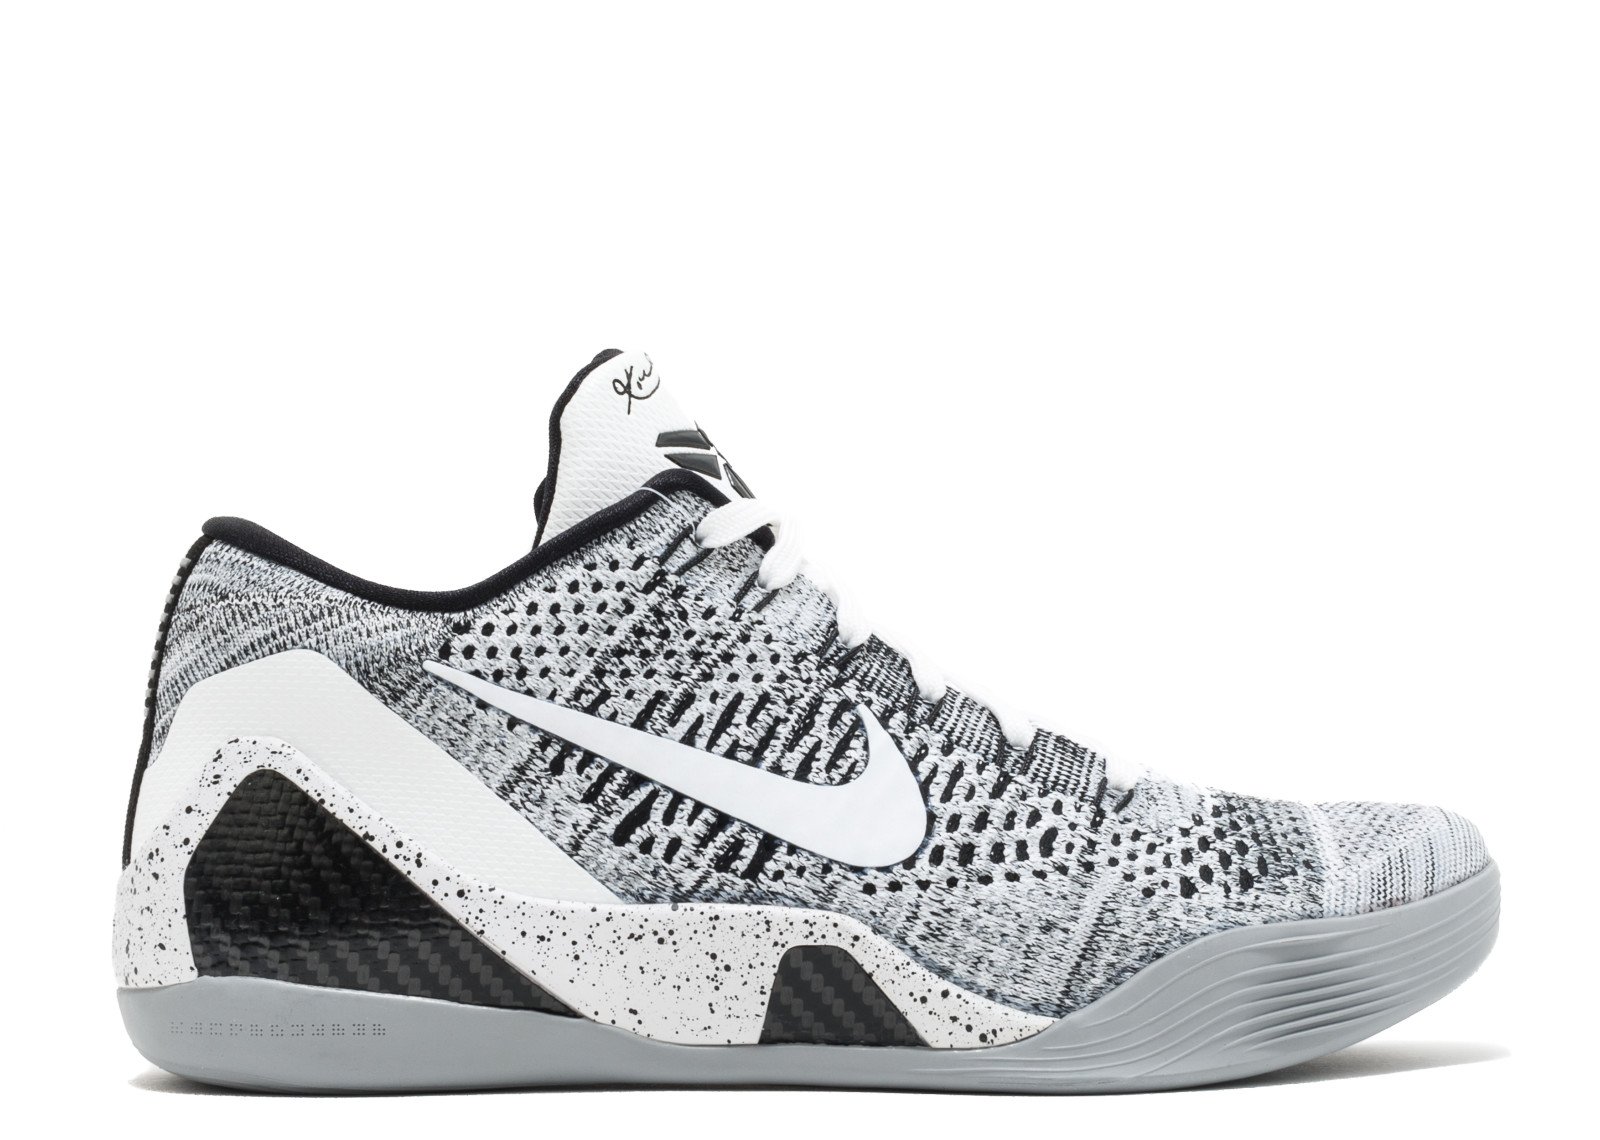 lowest price 93d8a fbb5e Nike - Men - Kobe 9 Elite Low  Beethoven  - 639045-101 - Size 12